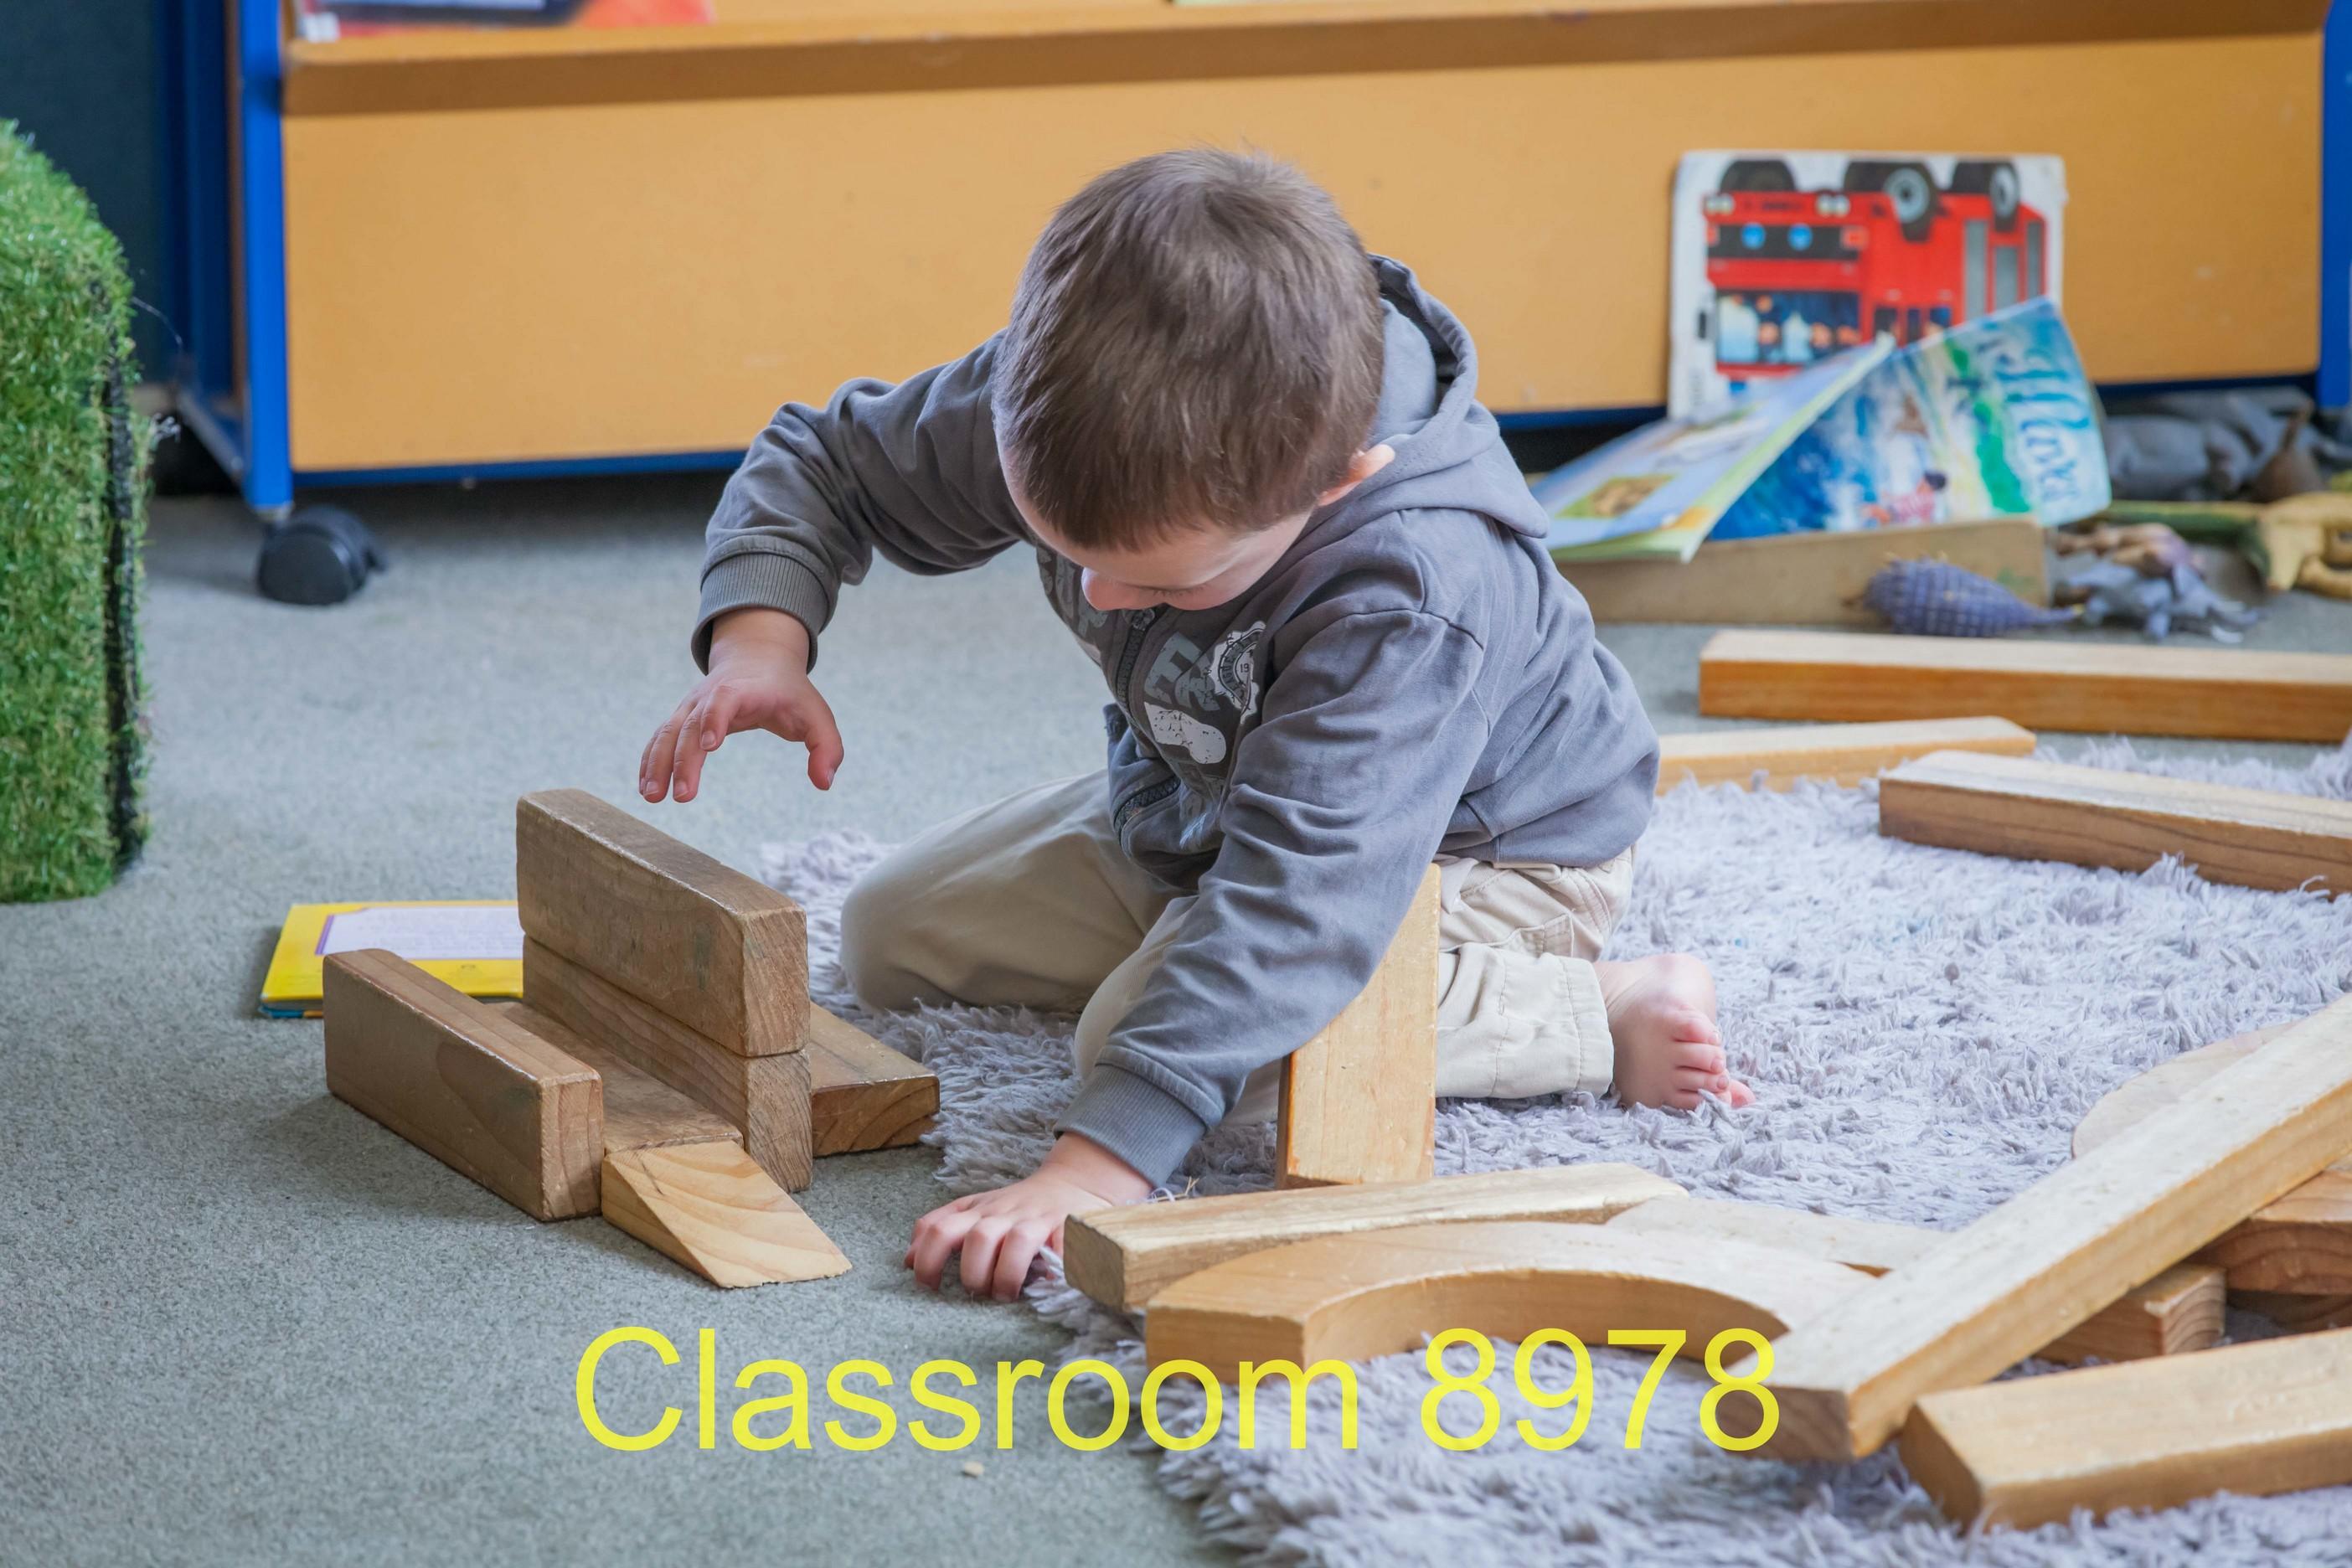 Classroom 8978